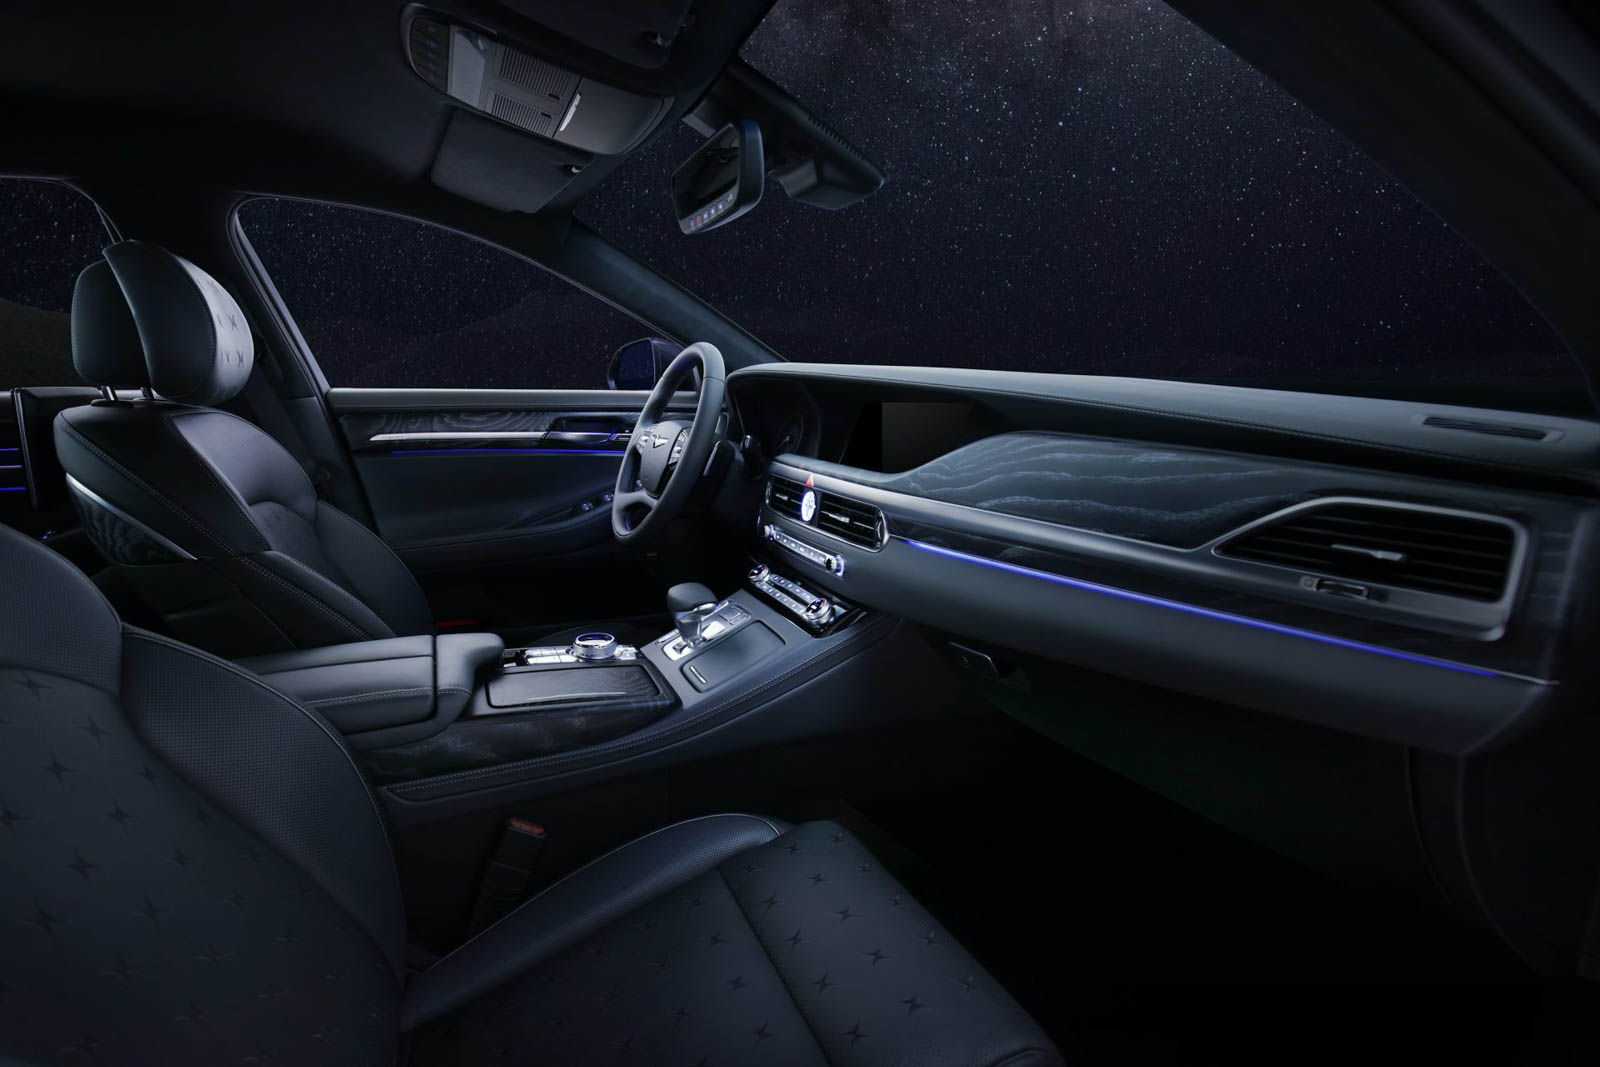 Hyundai's Genesis G90 Luxury Sedan Gets Stardust Special Edition For 2021